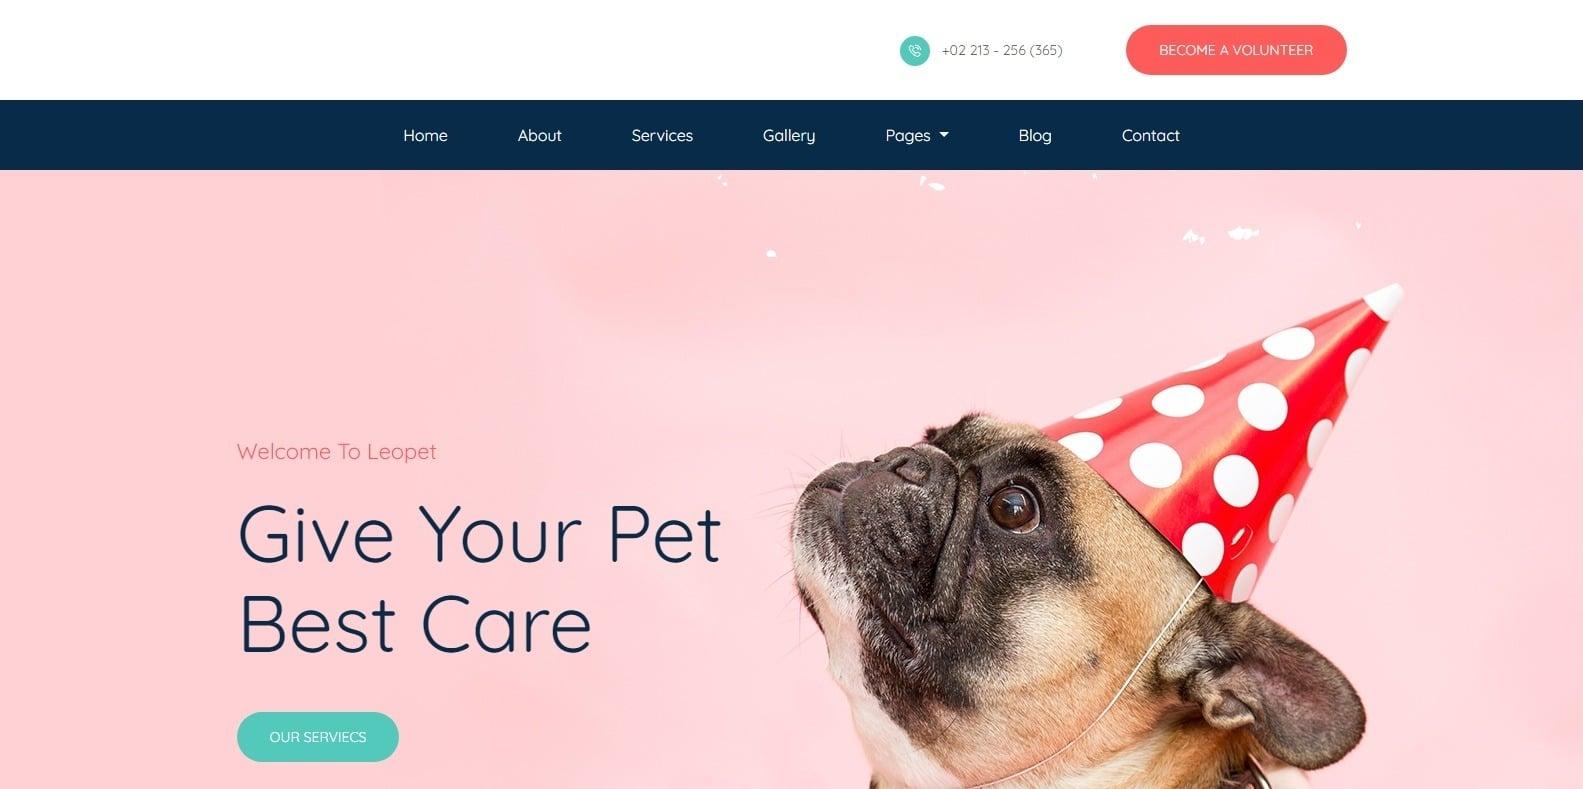 leopet-animal-website-template